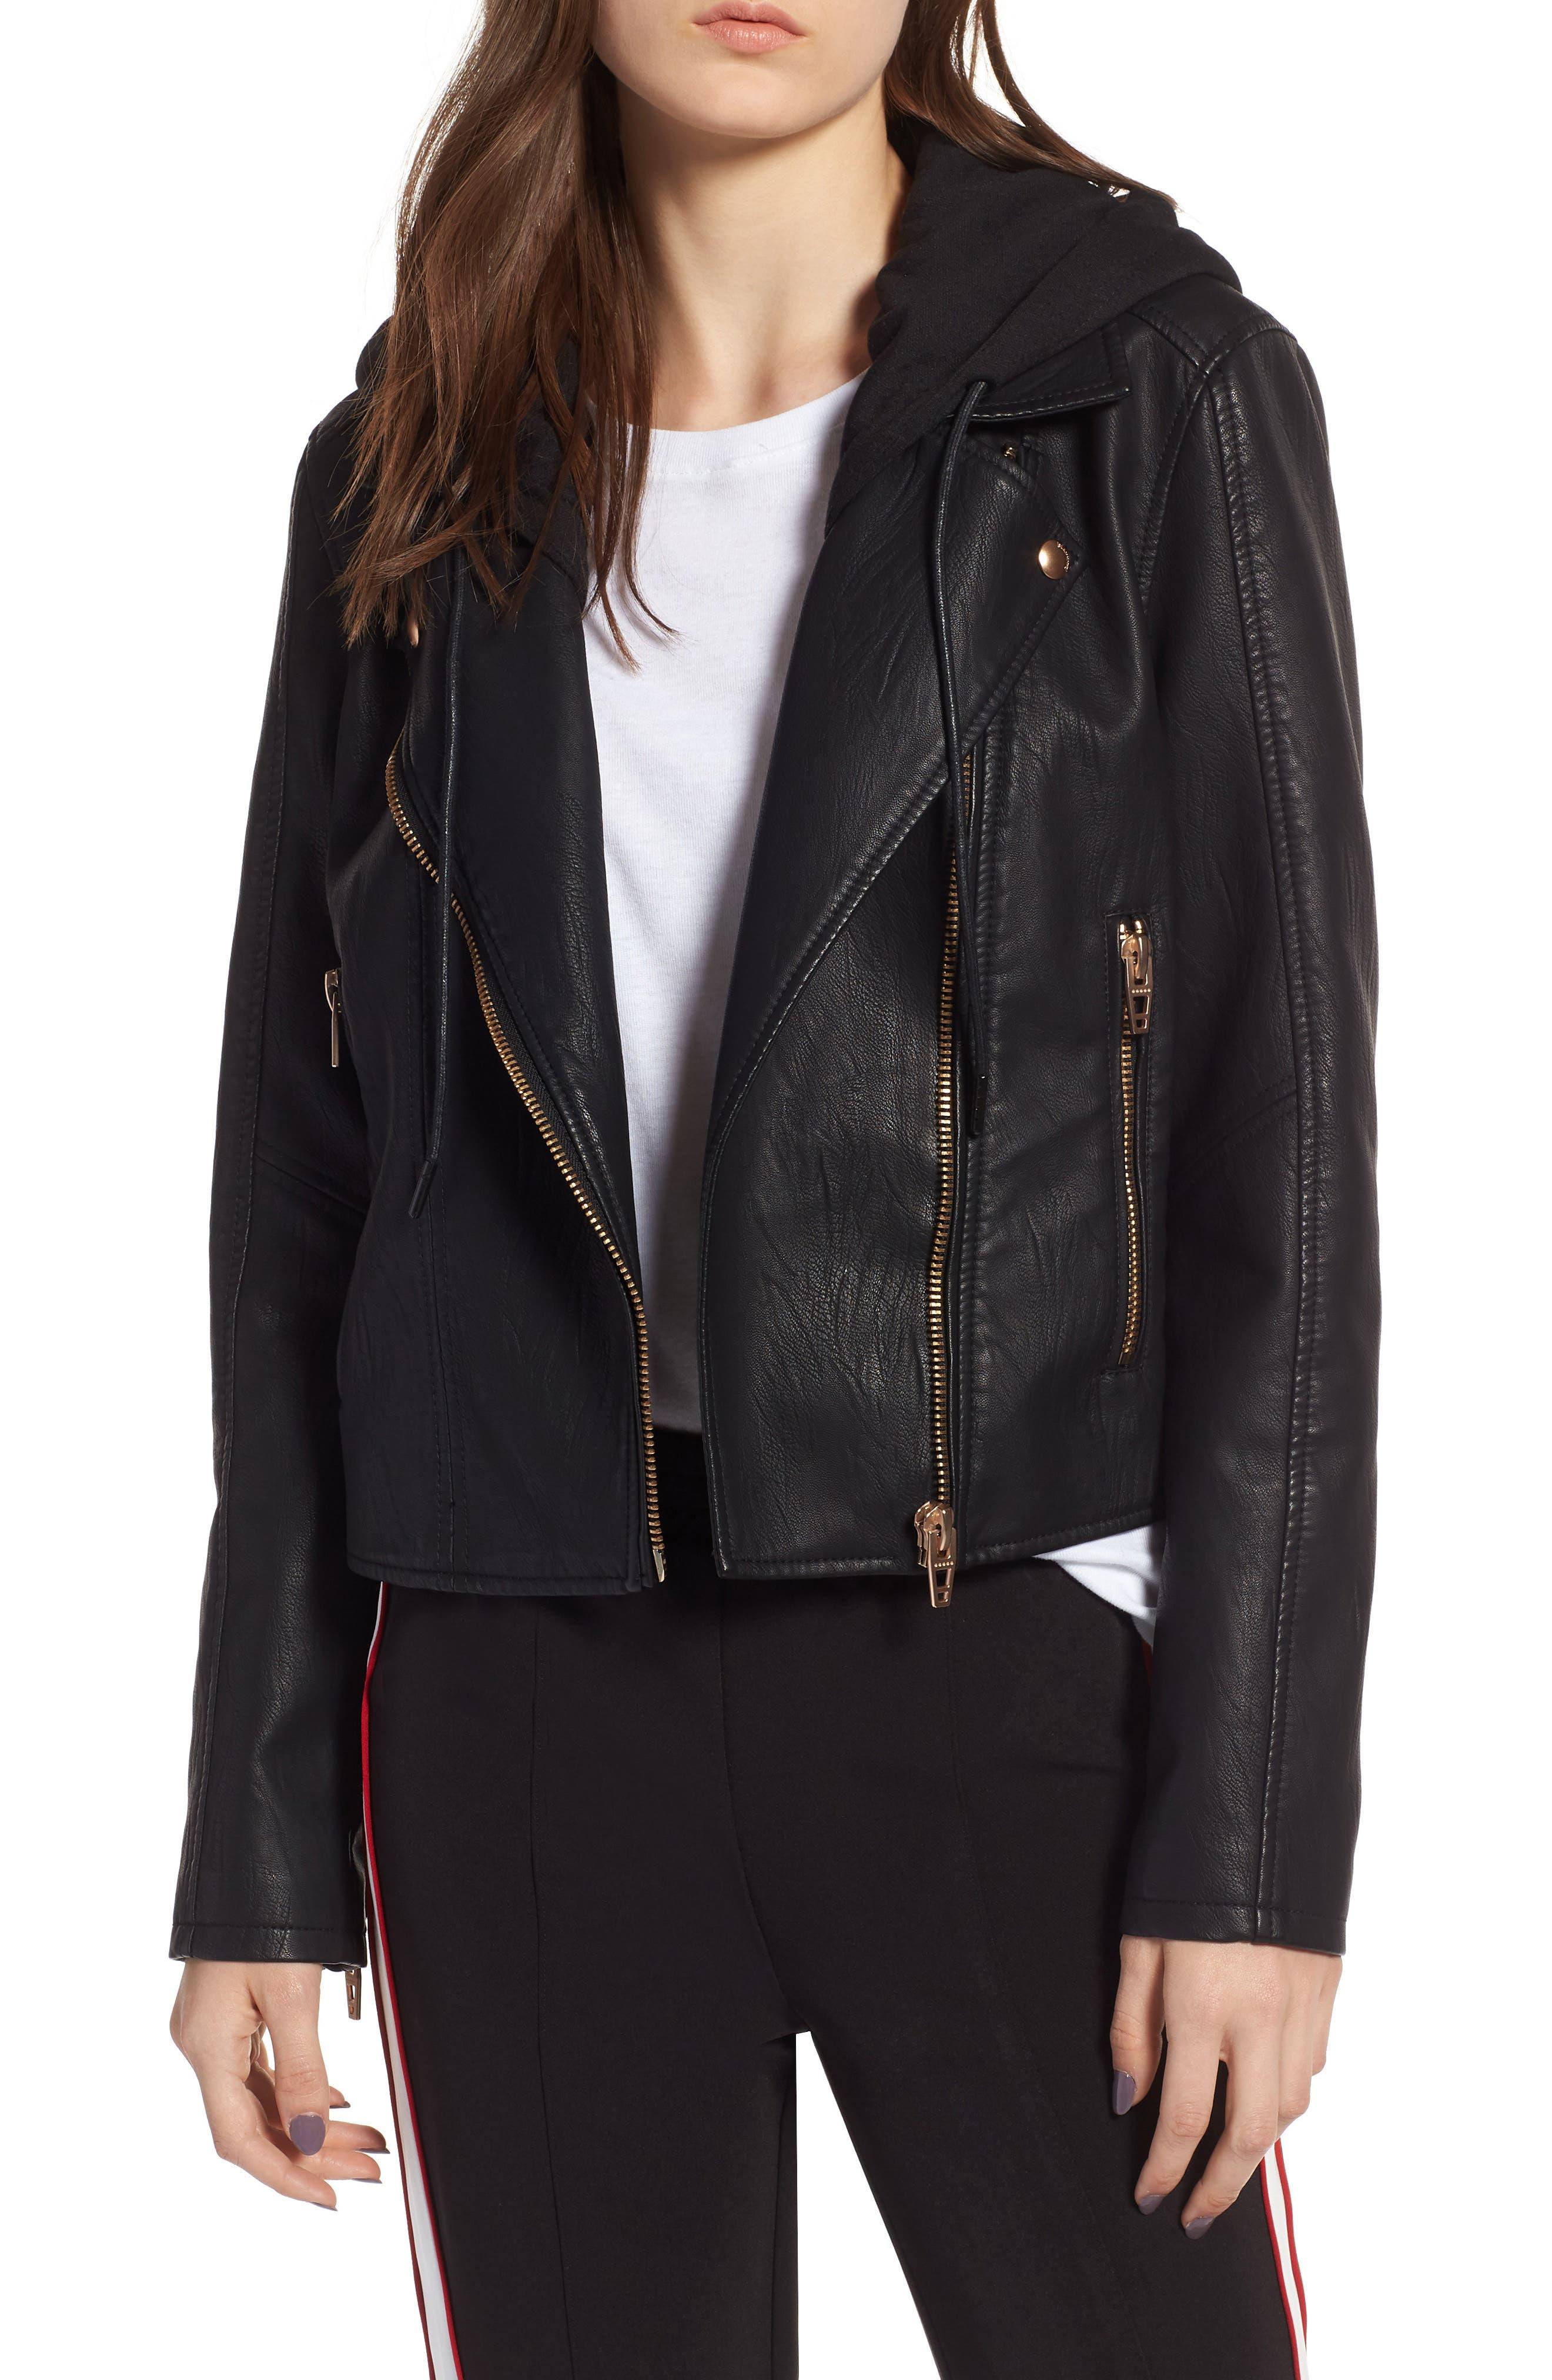 19 Women PU Leather Coat Outdoor Waist Length Jackets Sequin Shinning Motor Chic